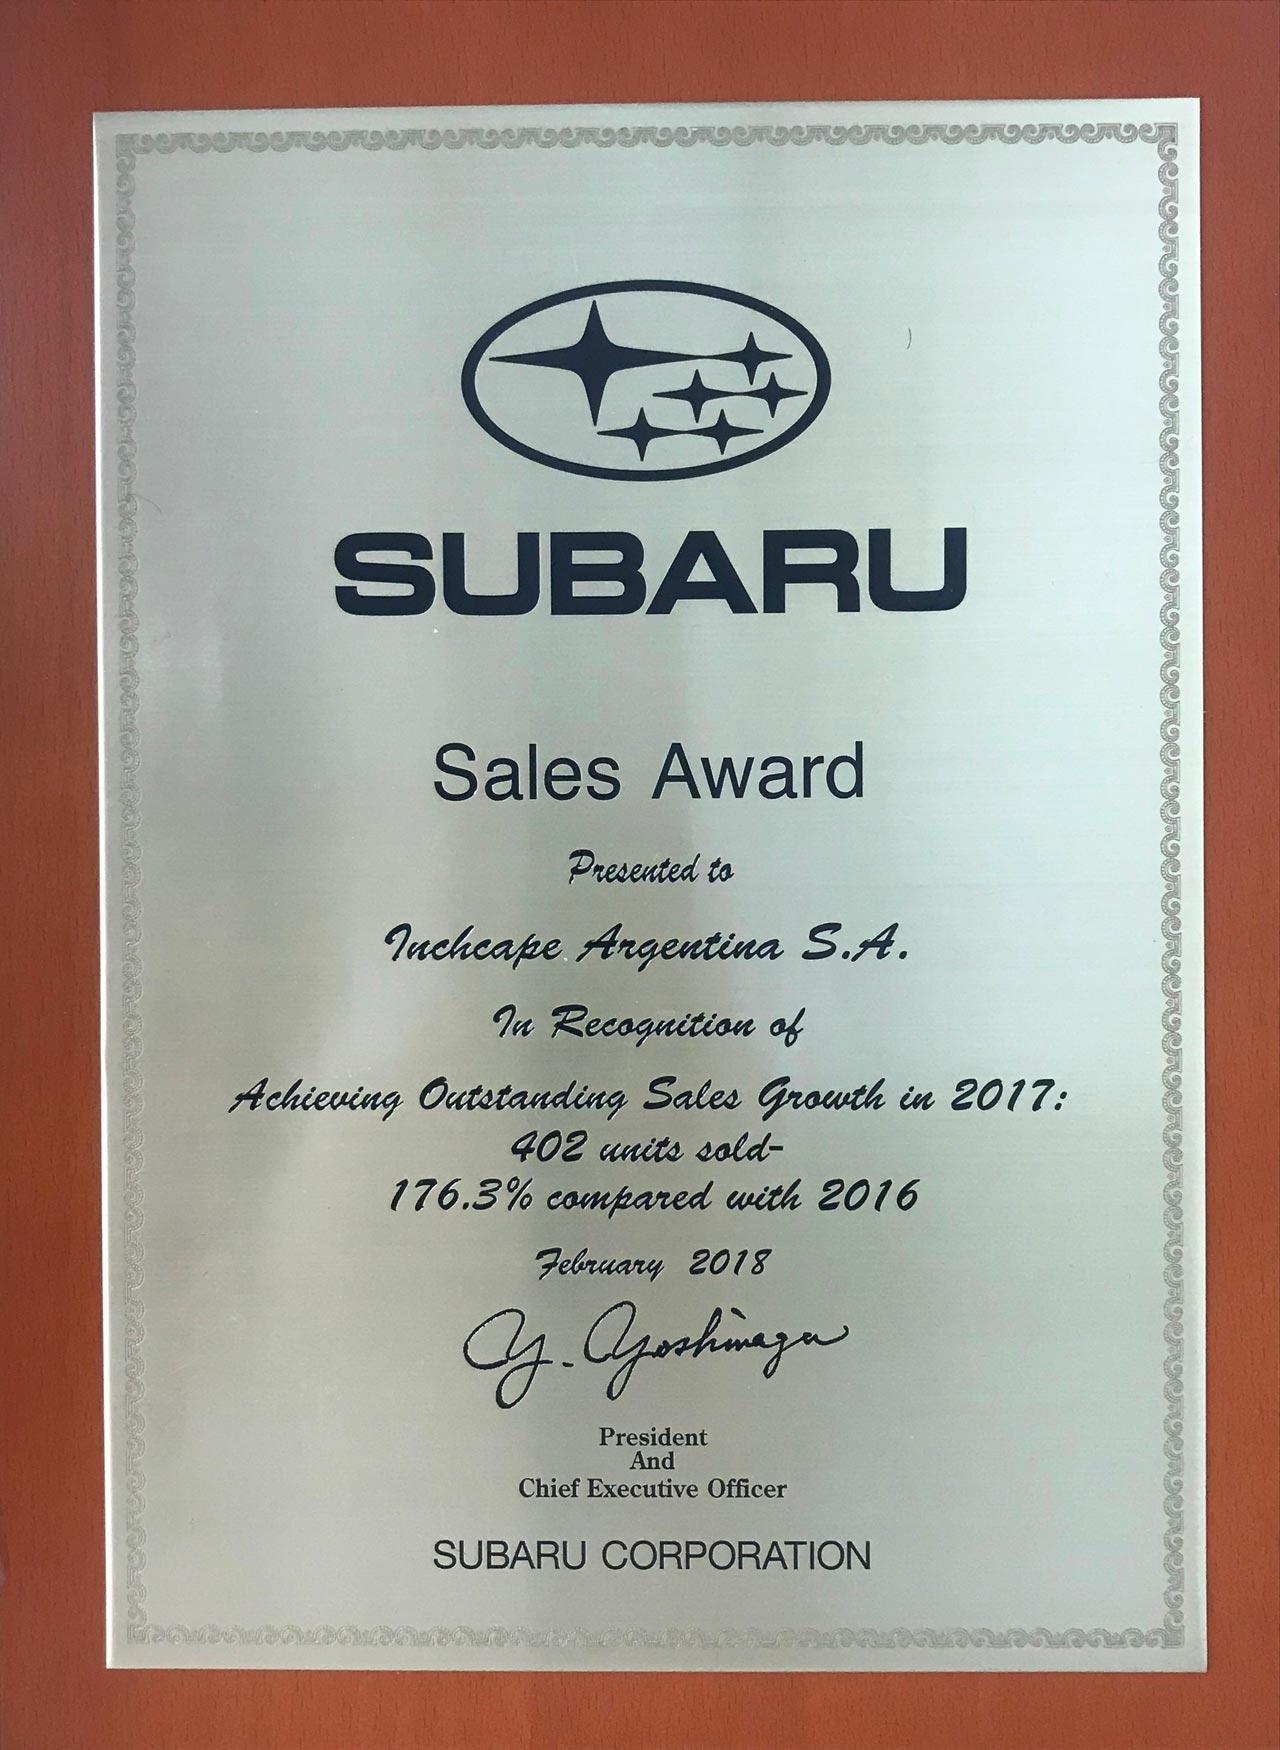 Subaru Argentina, Sales Award